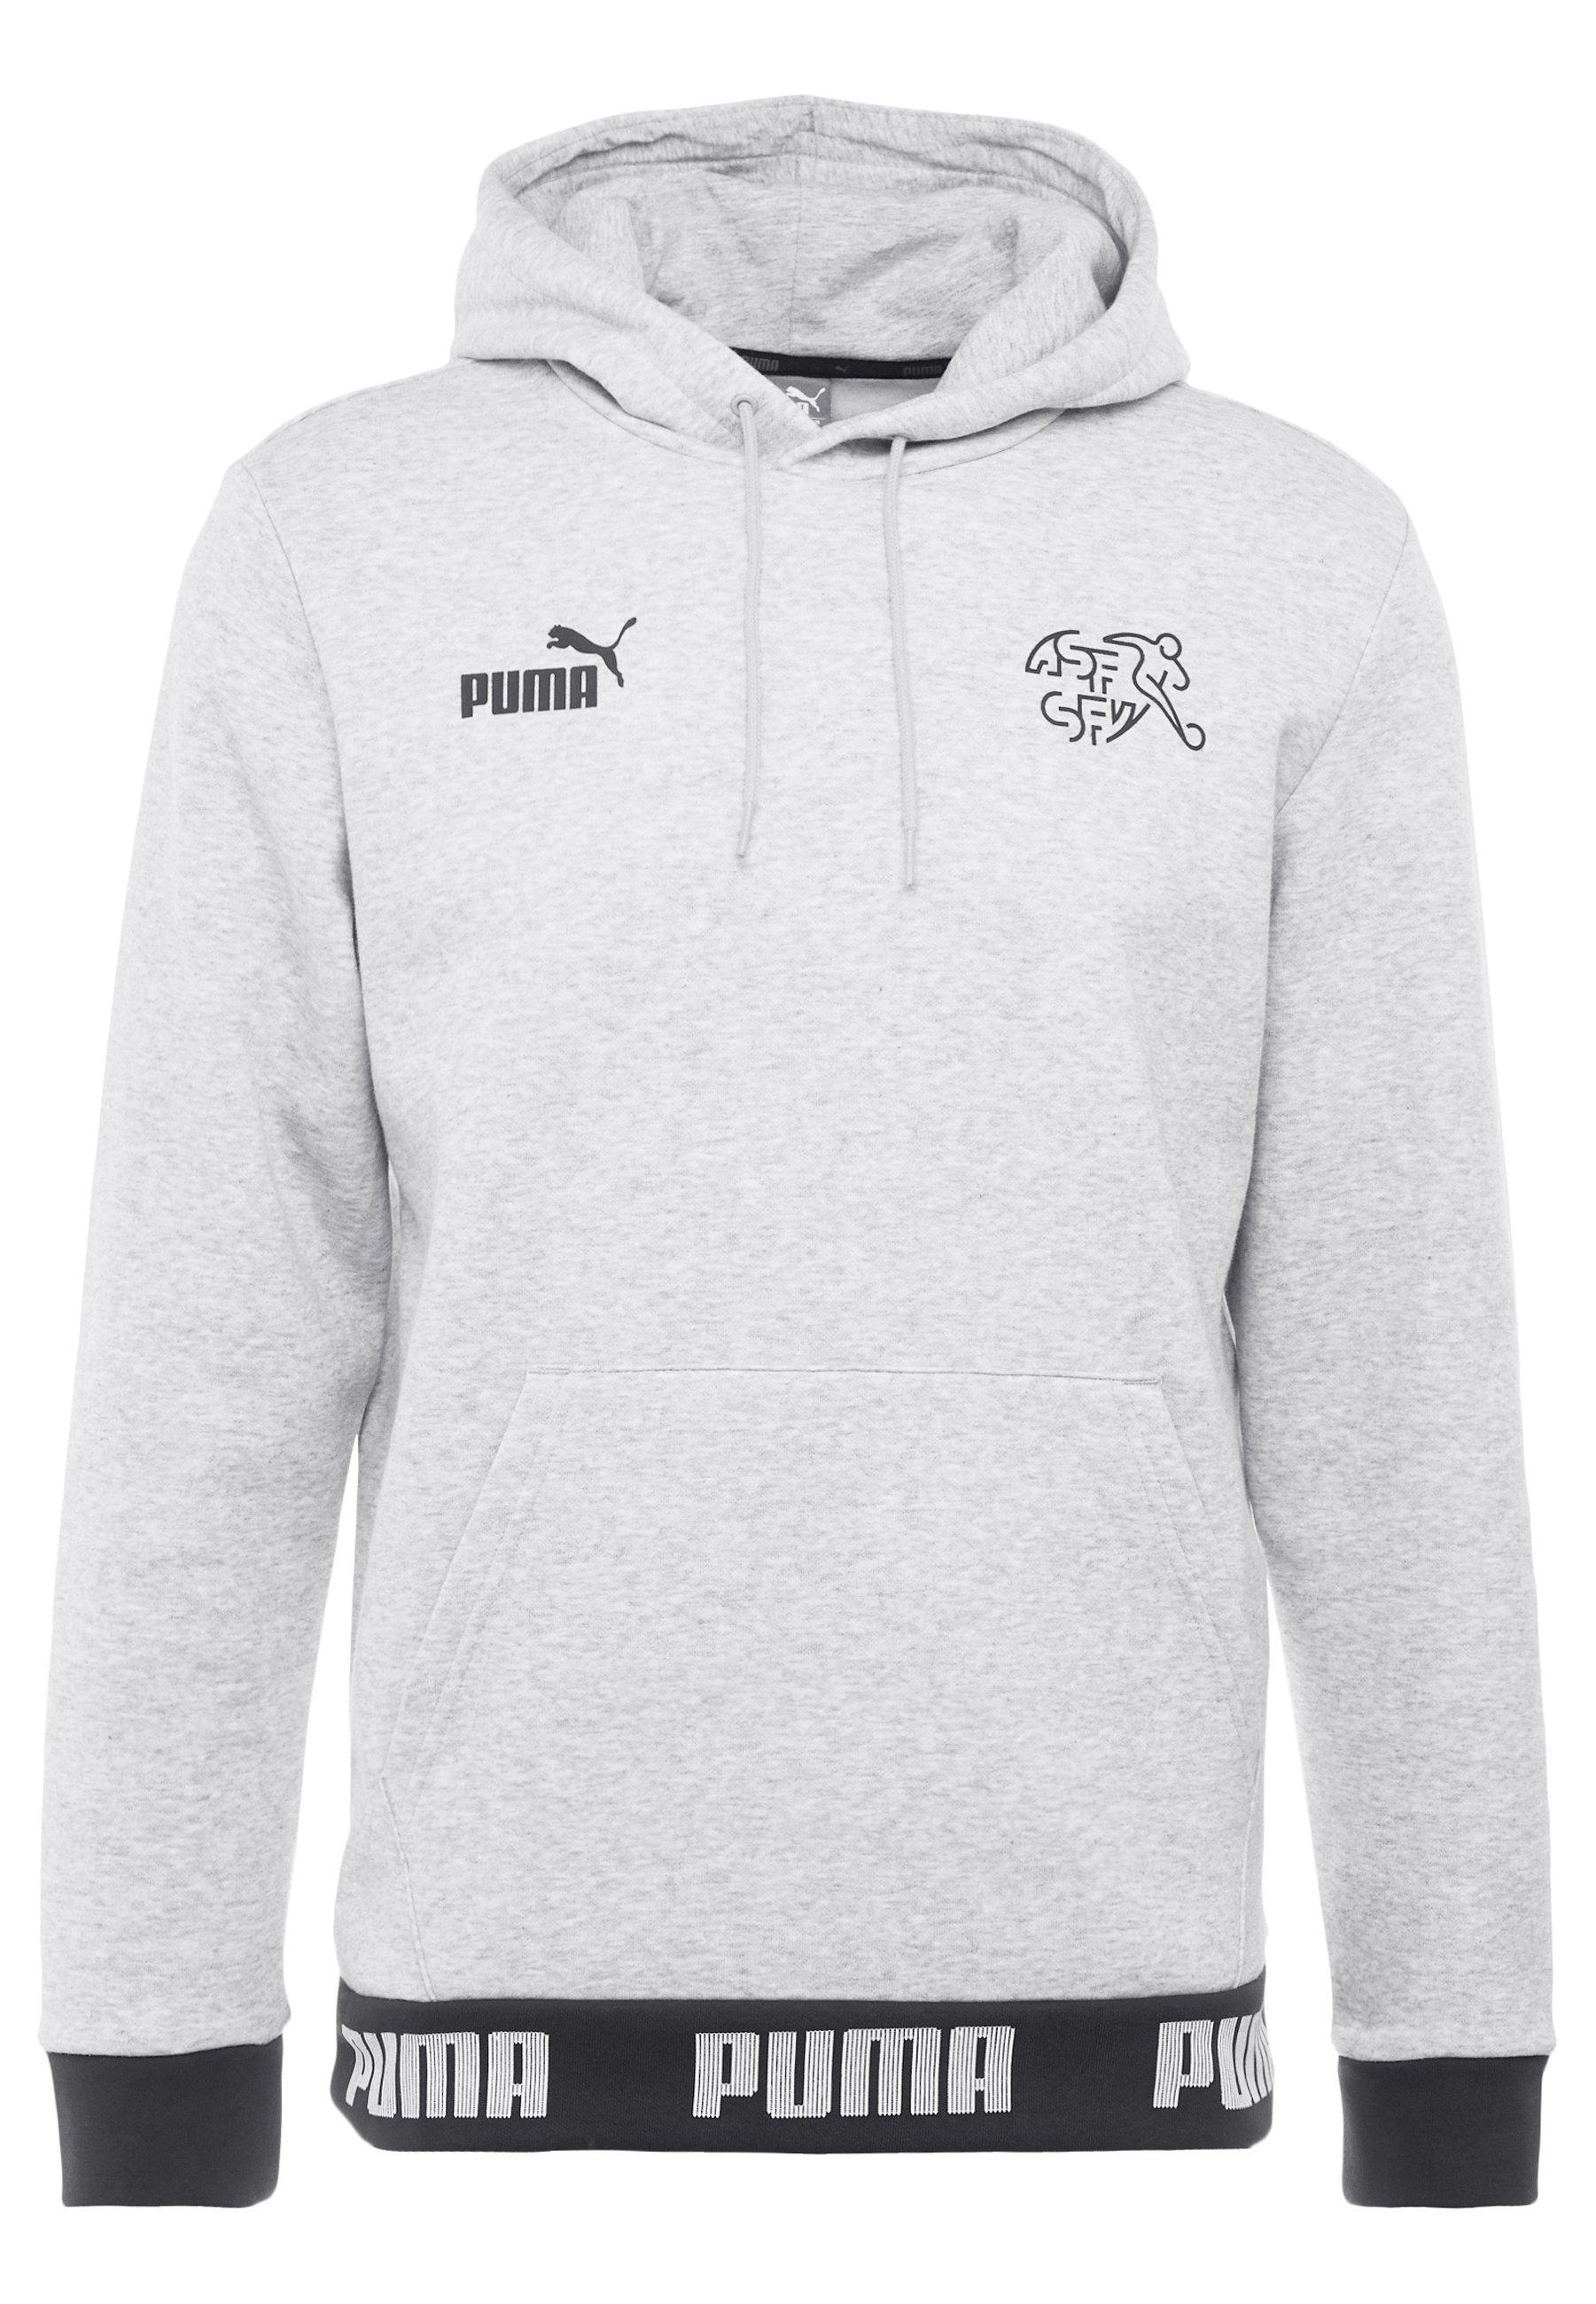 Puma SCHWEIZ SFV CULTURE HOODY - Bluza z kapturem - light gray heather